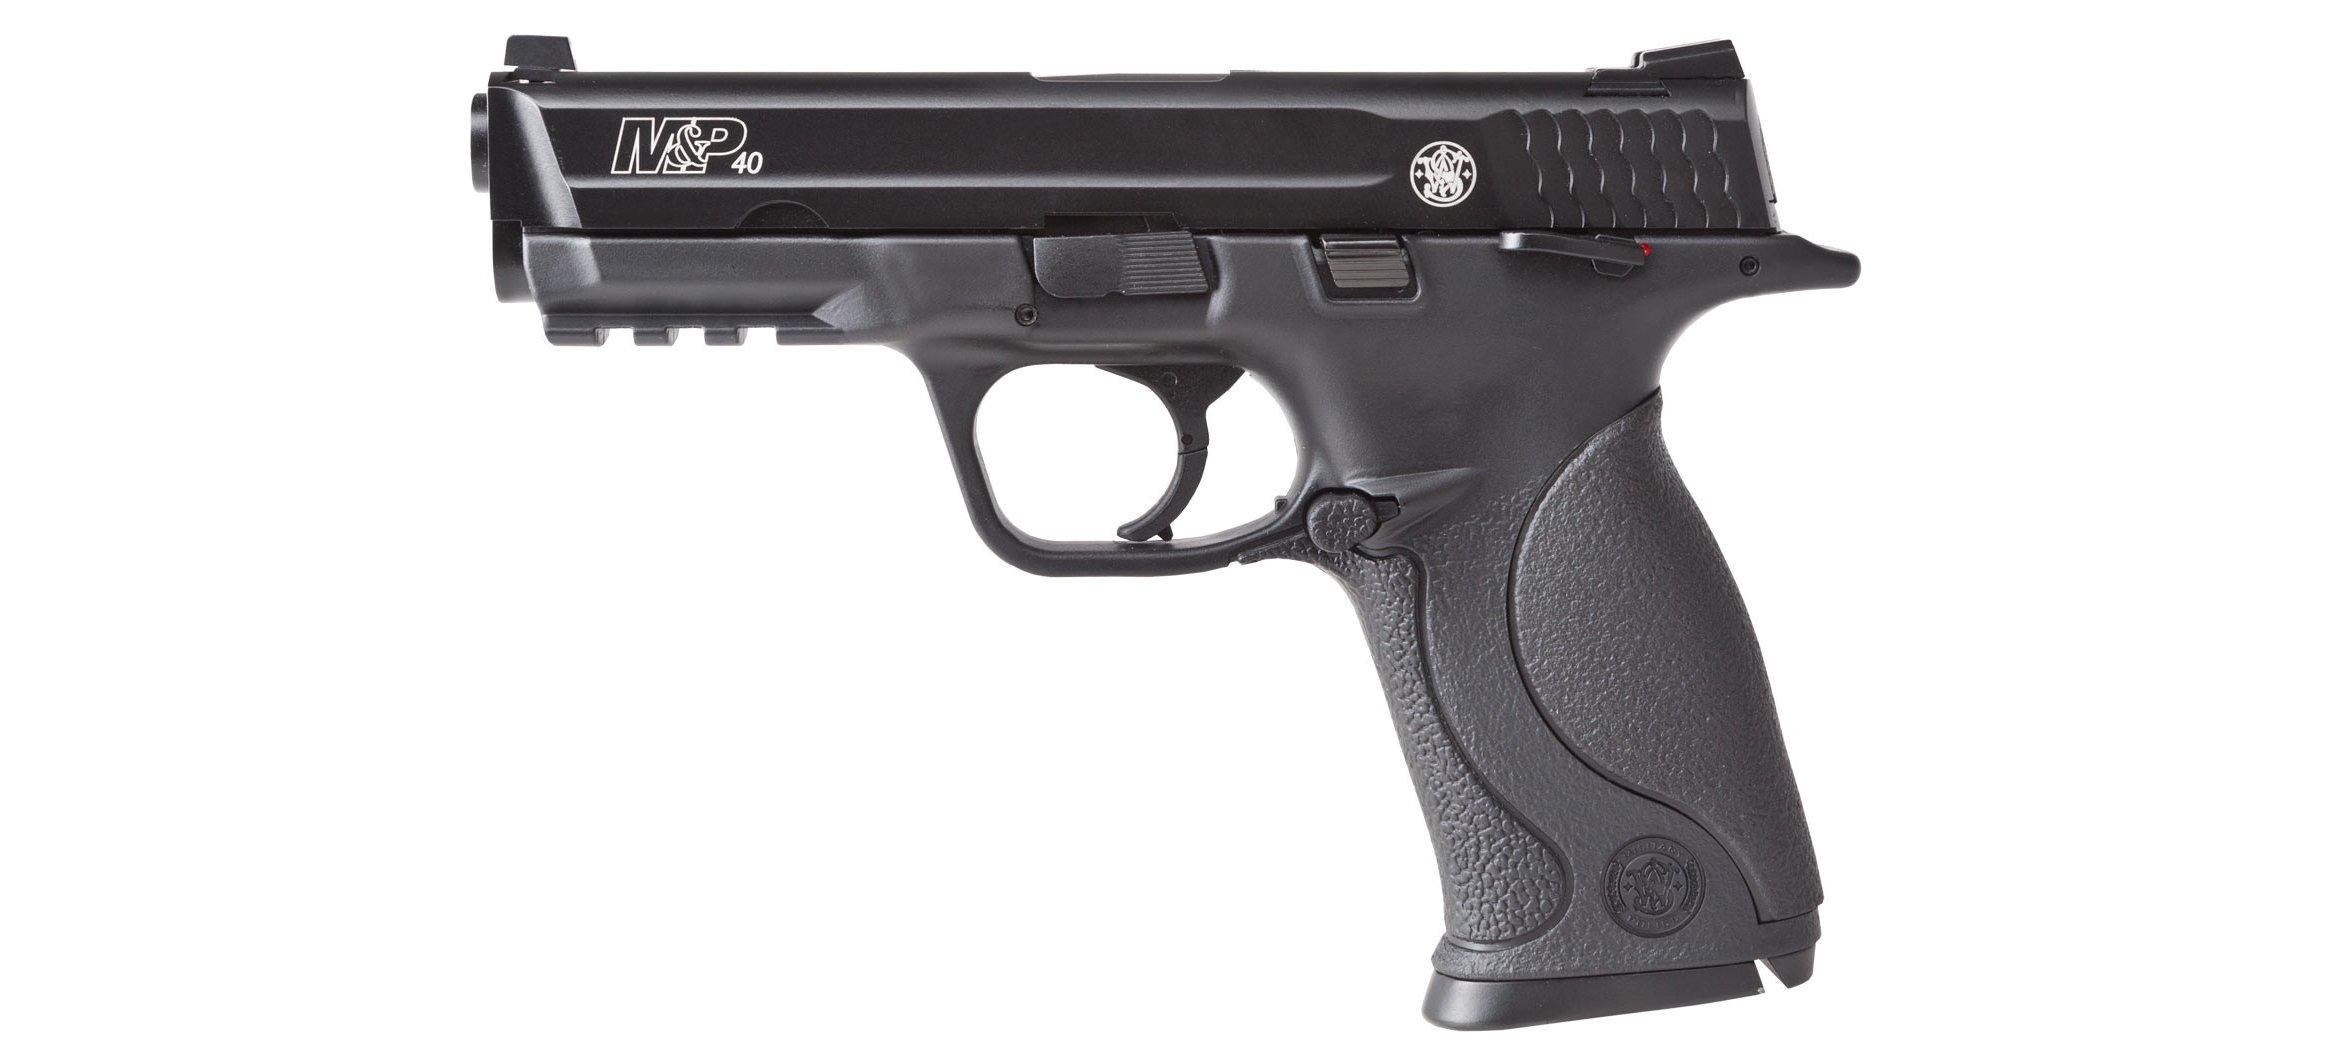 Pistolet Pistolet Smith & Wesson M&P 40 TS kal. 4,5mm BB